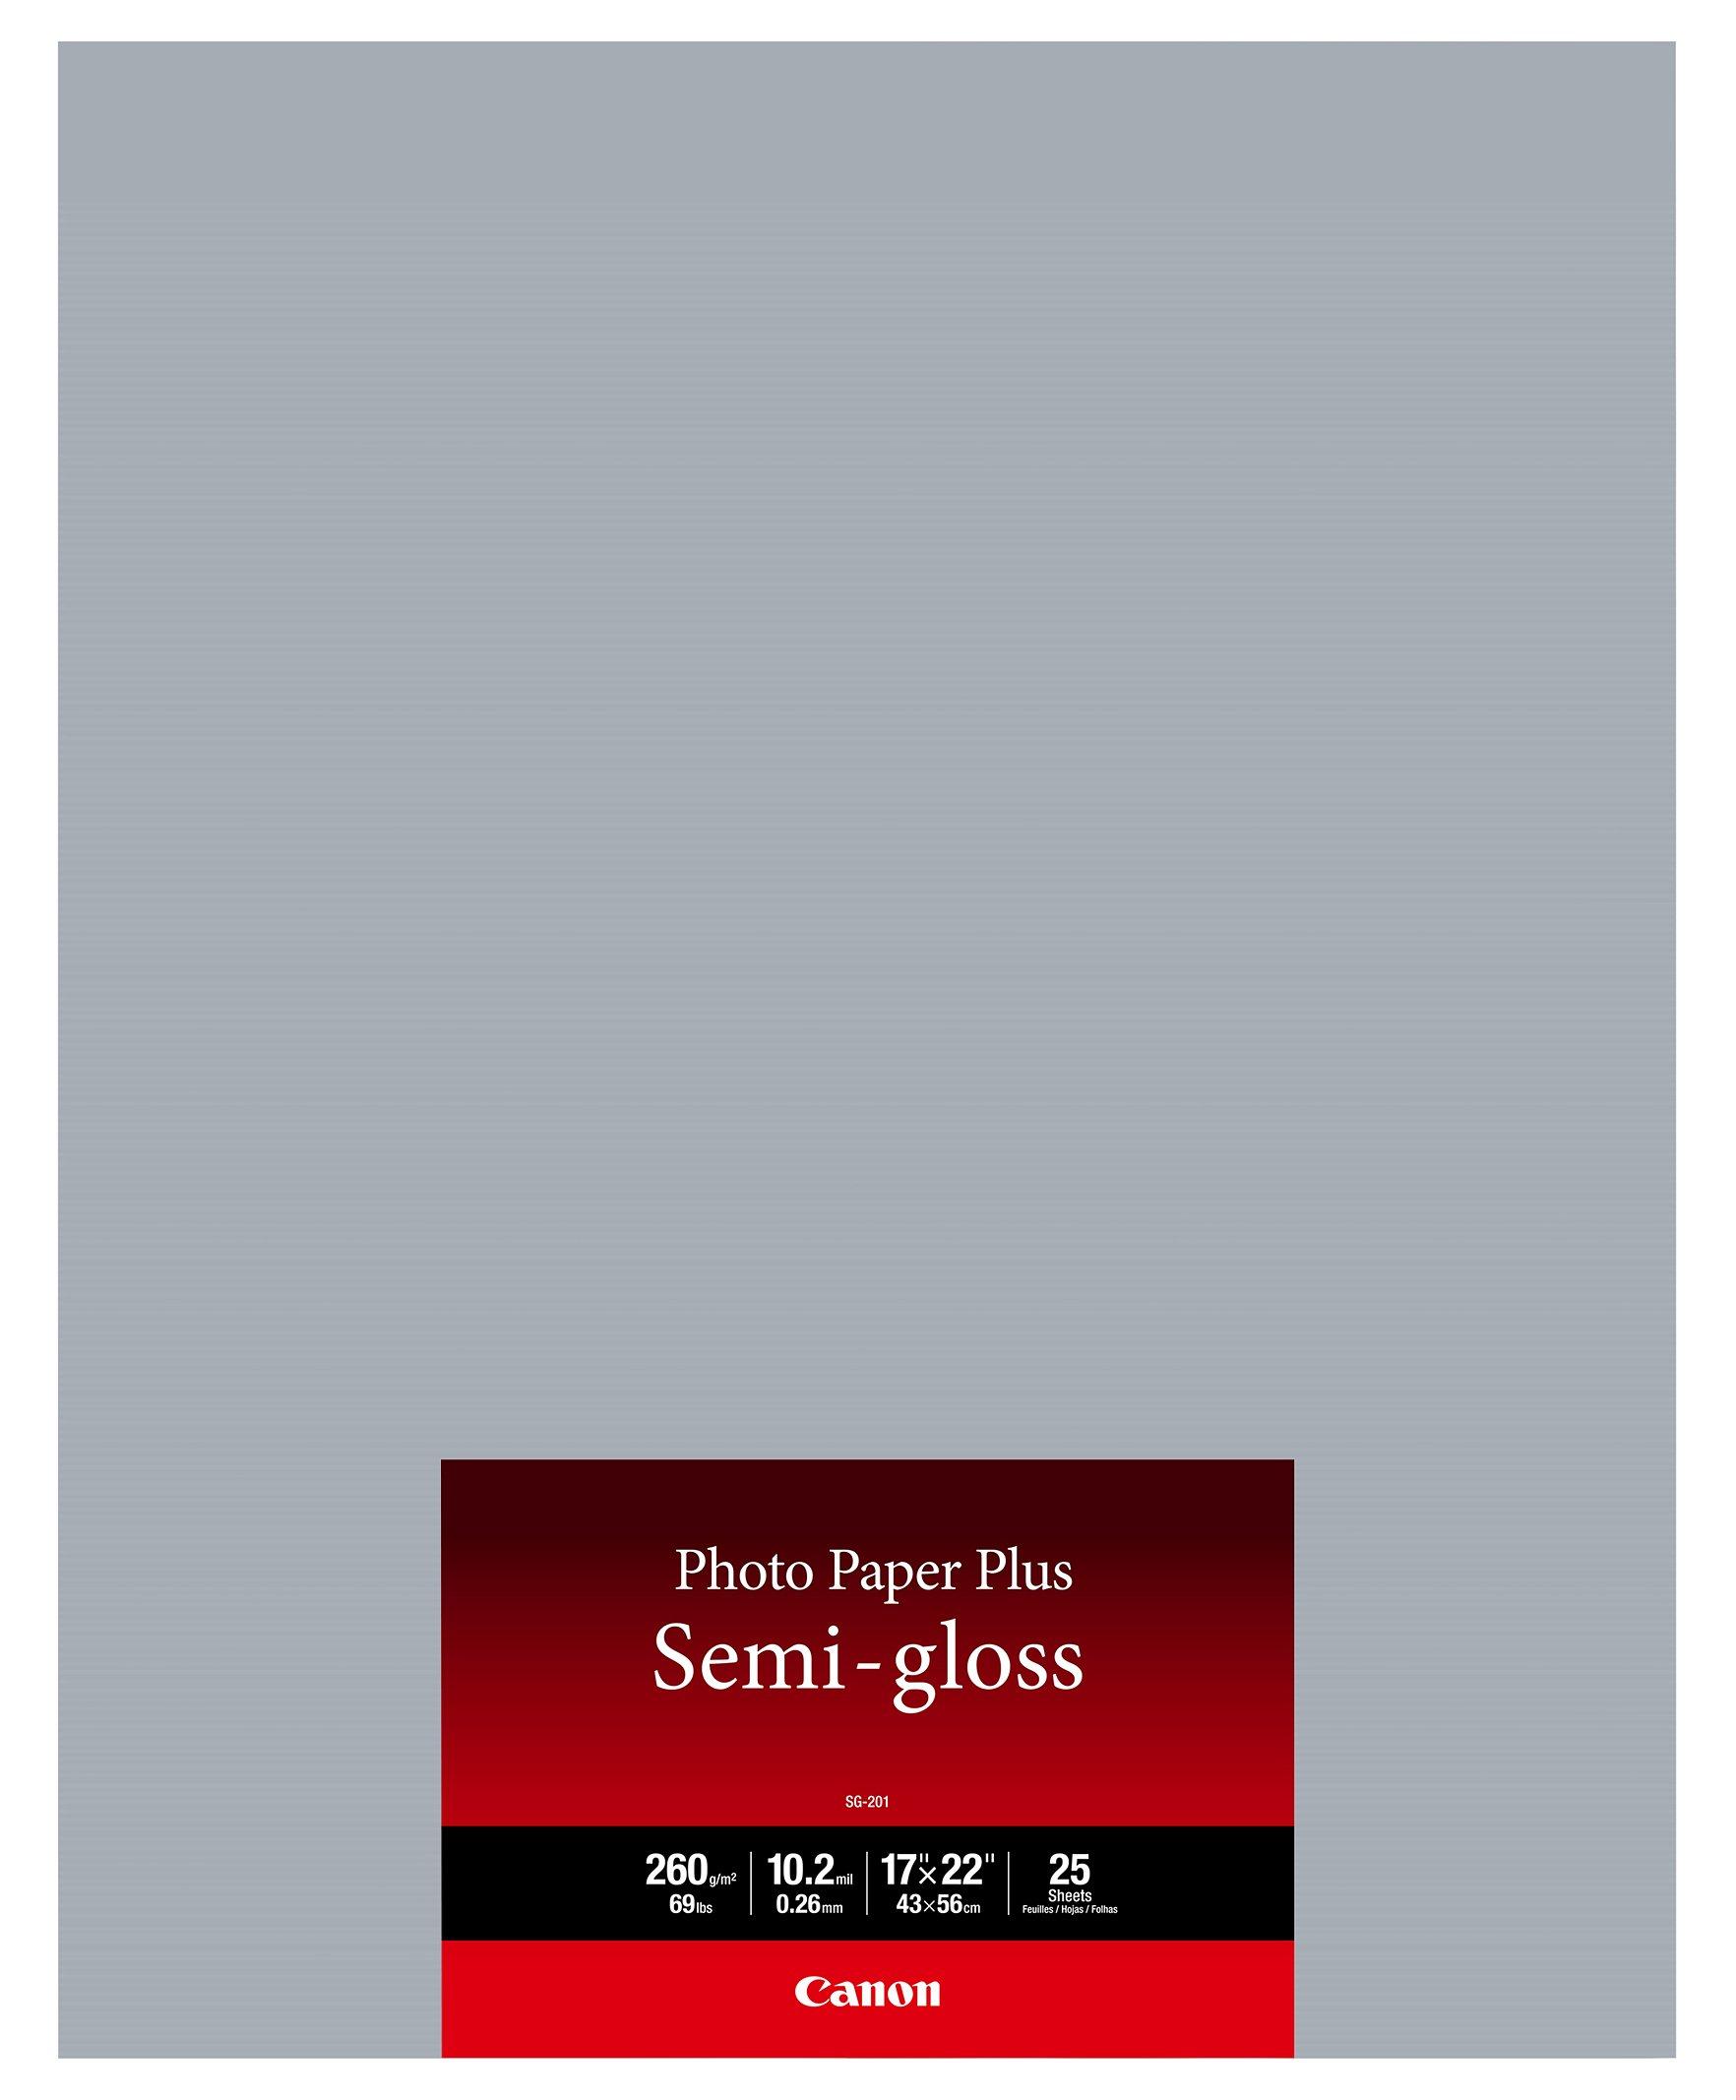 Canon Semi-Gloss Photo Paper, 17'x22', 25 sheets by Canon